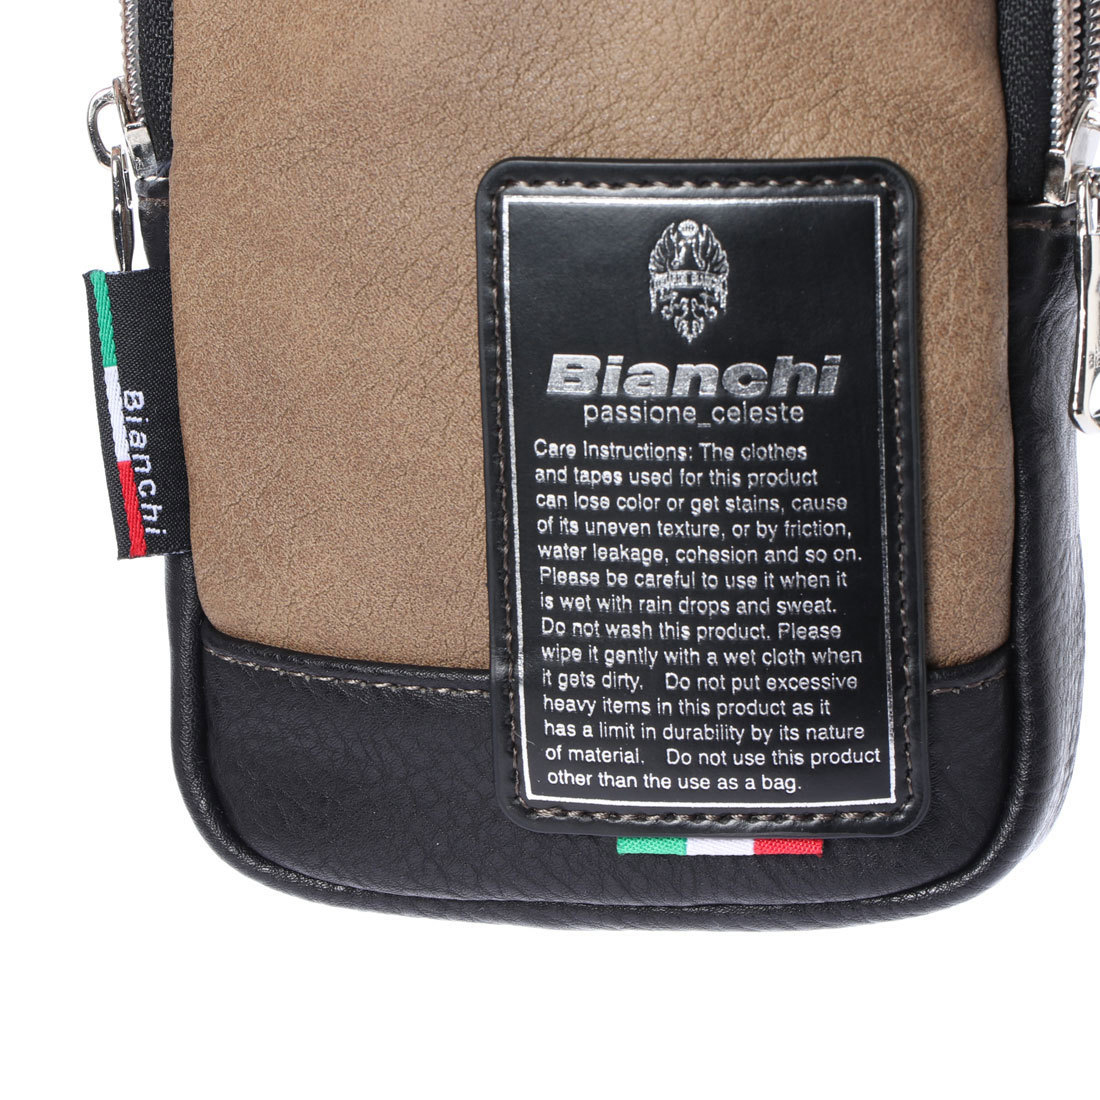 【Bianchi】ミニポーチ TBPI20